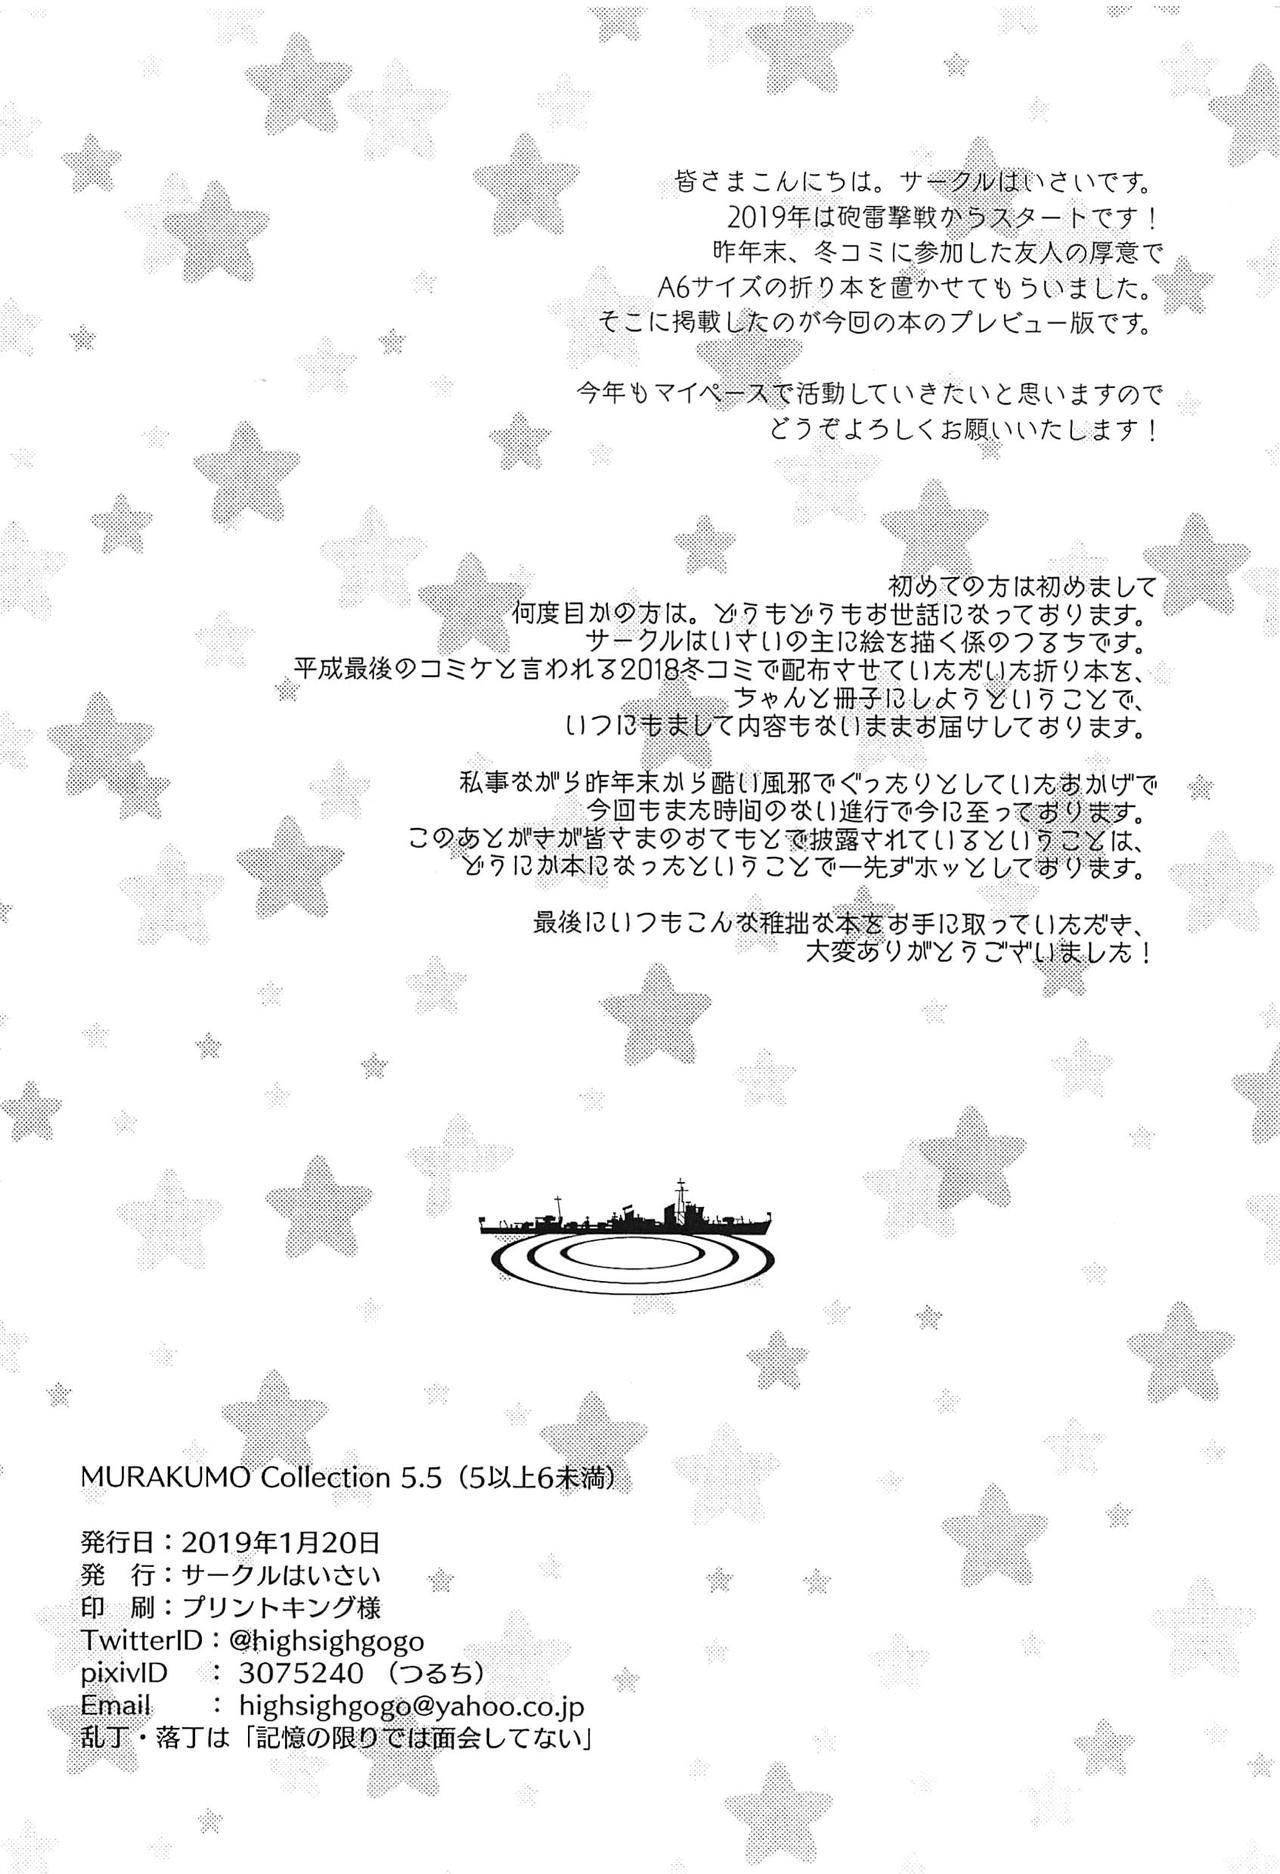 MURAKUMO Collection 5.5 12